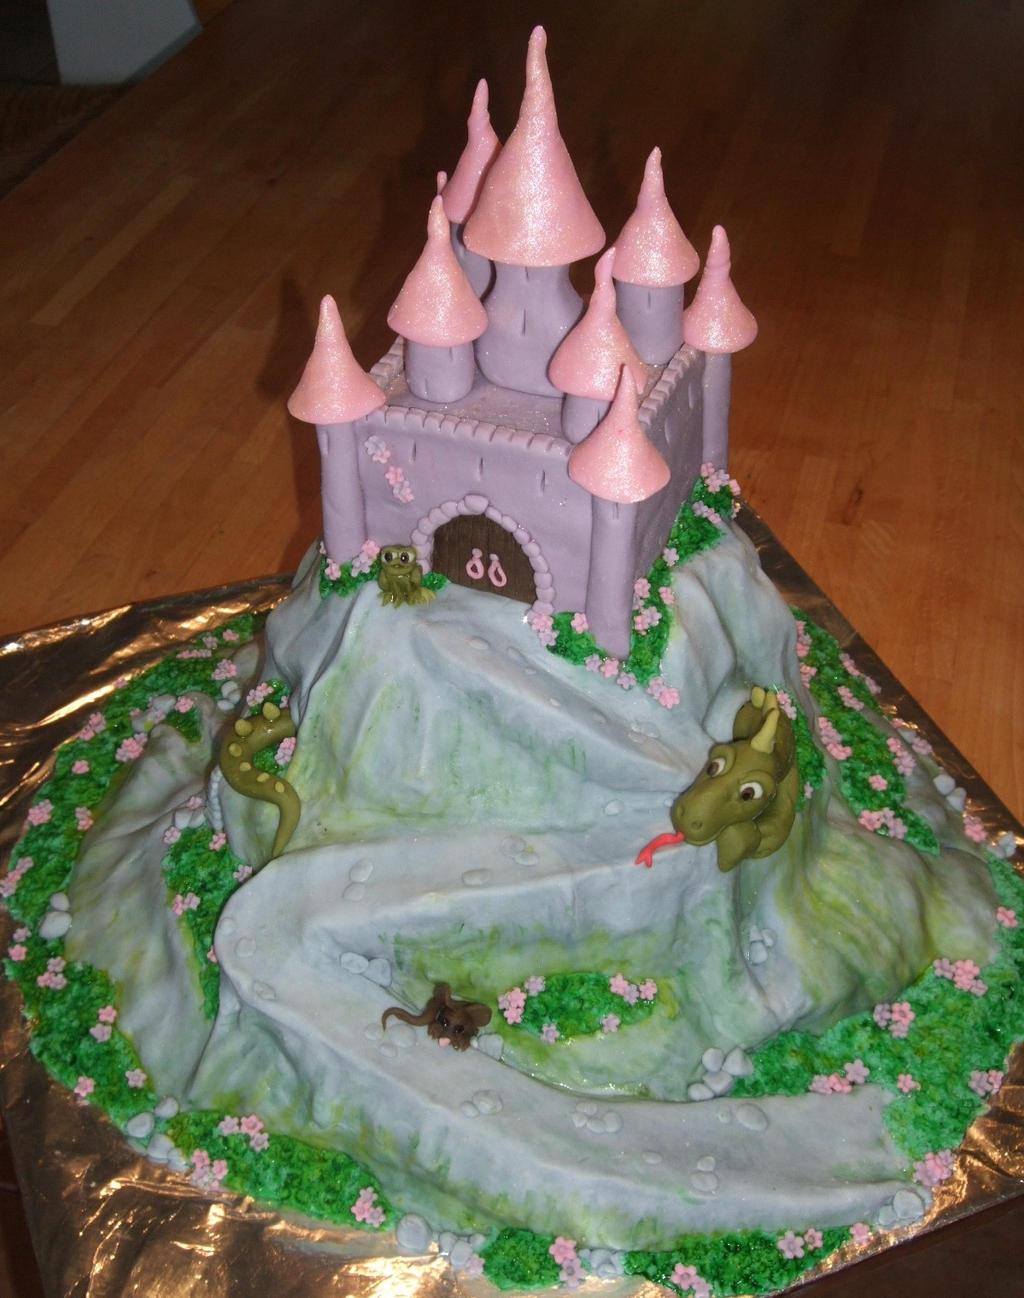 Fairy tale castle cake by Shoshannah84 on DeviantArt